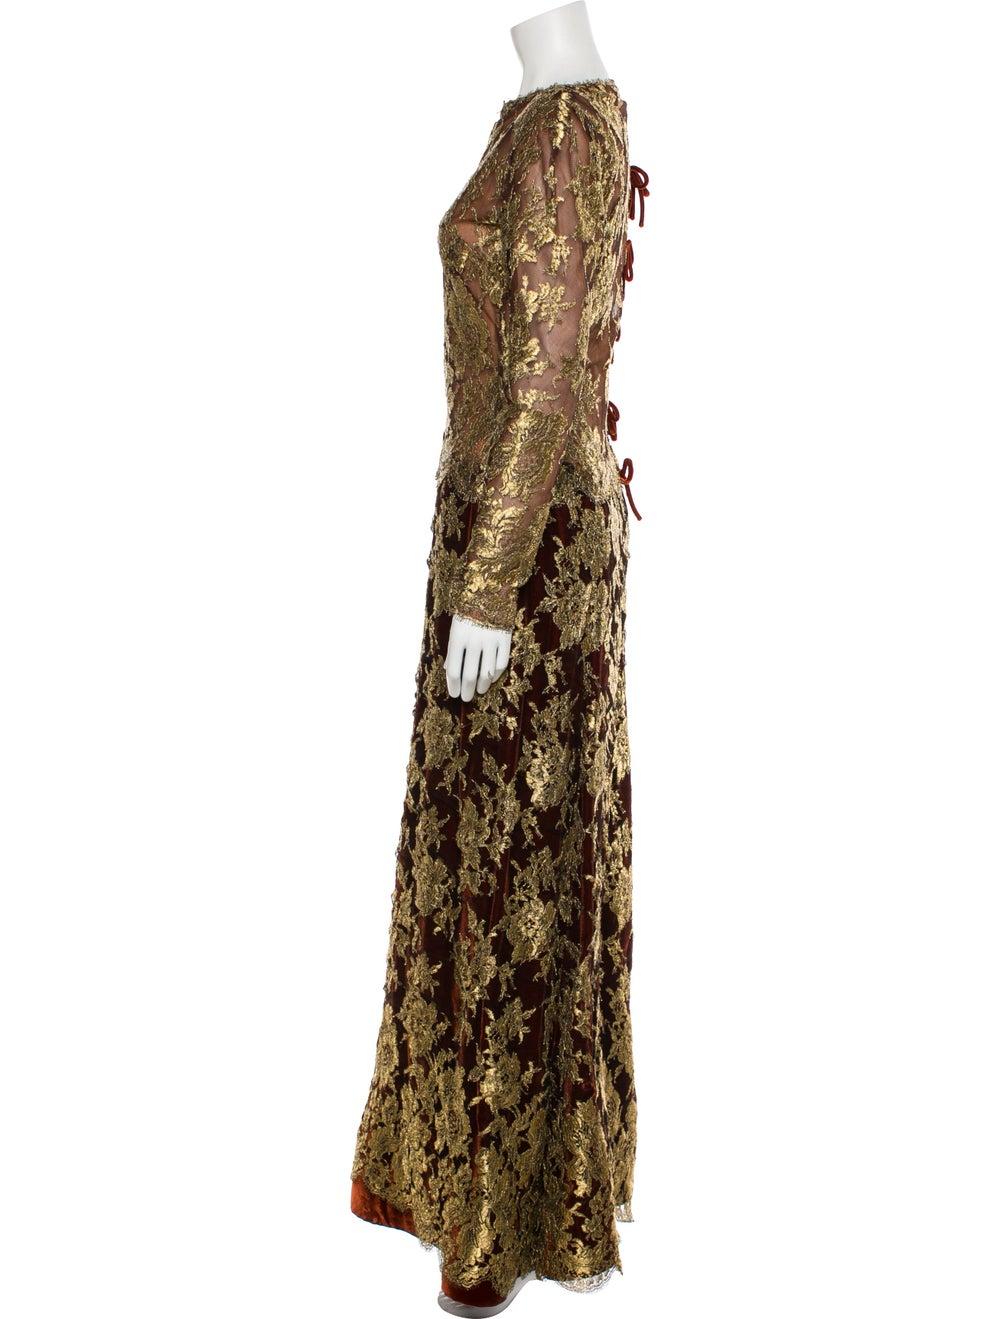 Arnold Scaasi Vintage Long Dress Gold - image 2